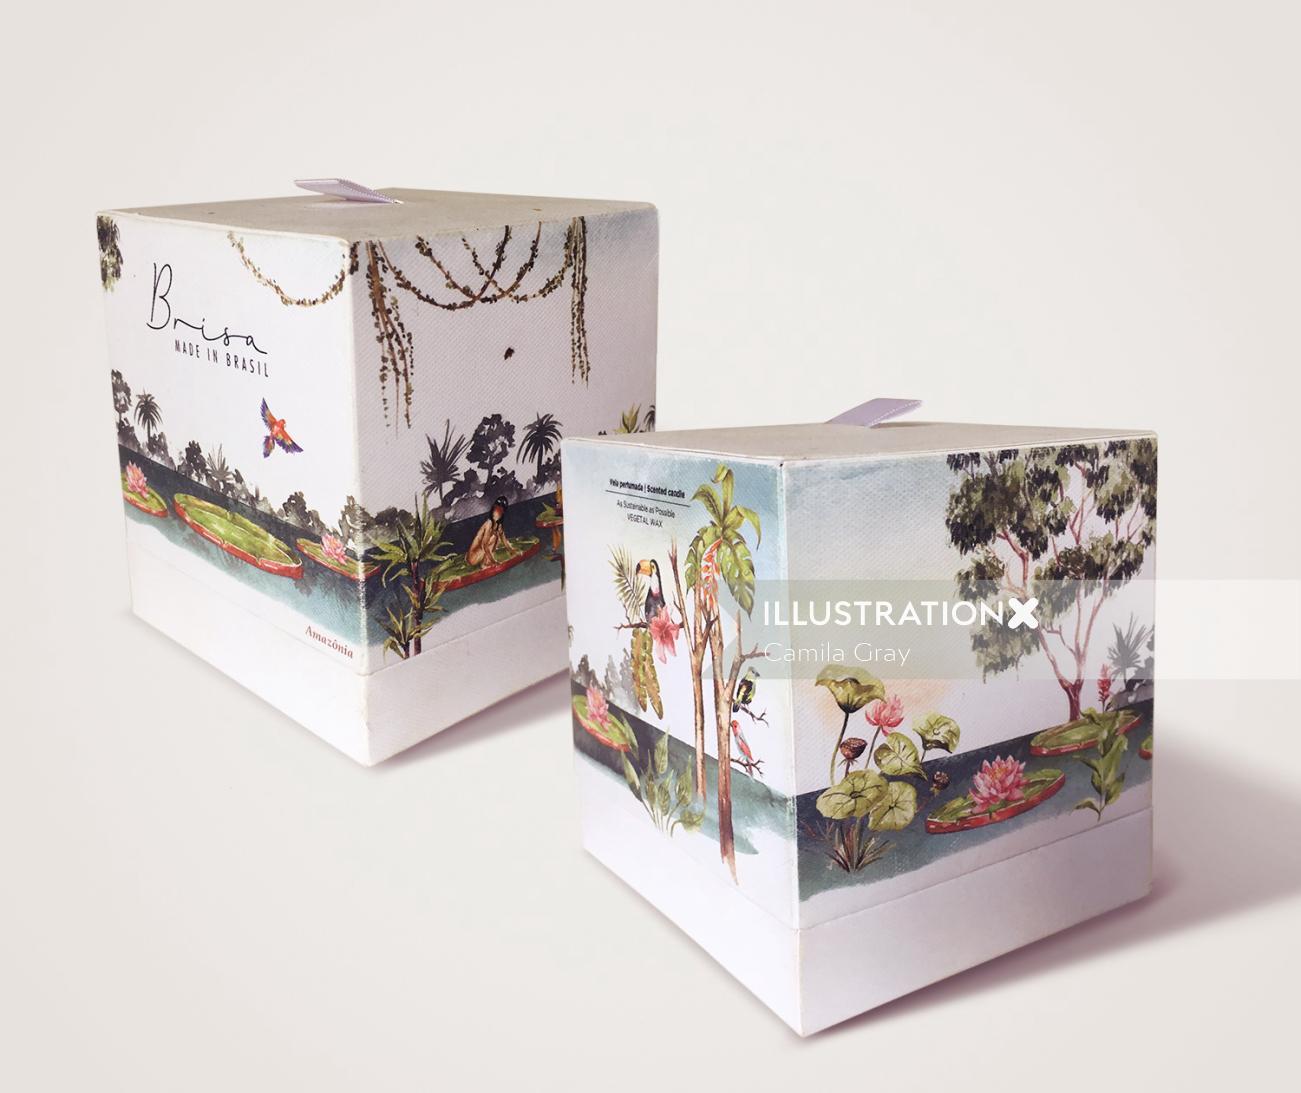 Amazonia's rainforest candle packaging illustration